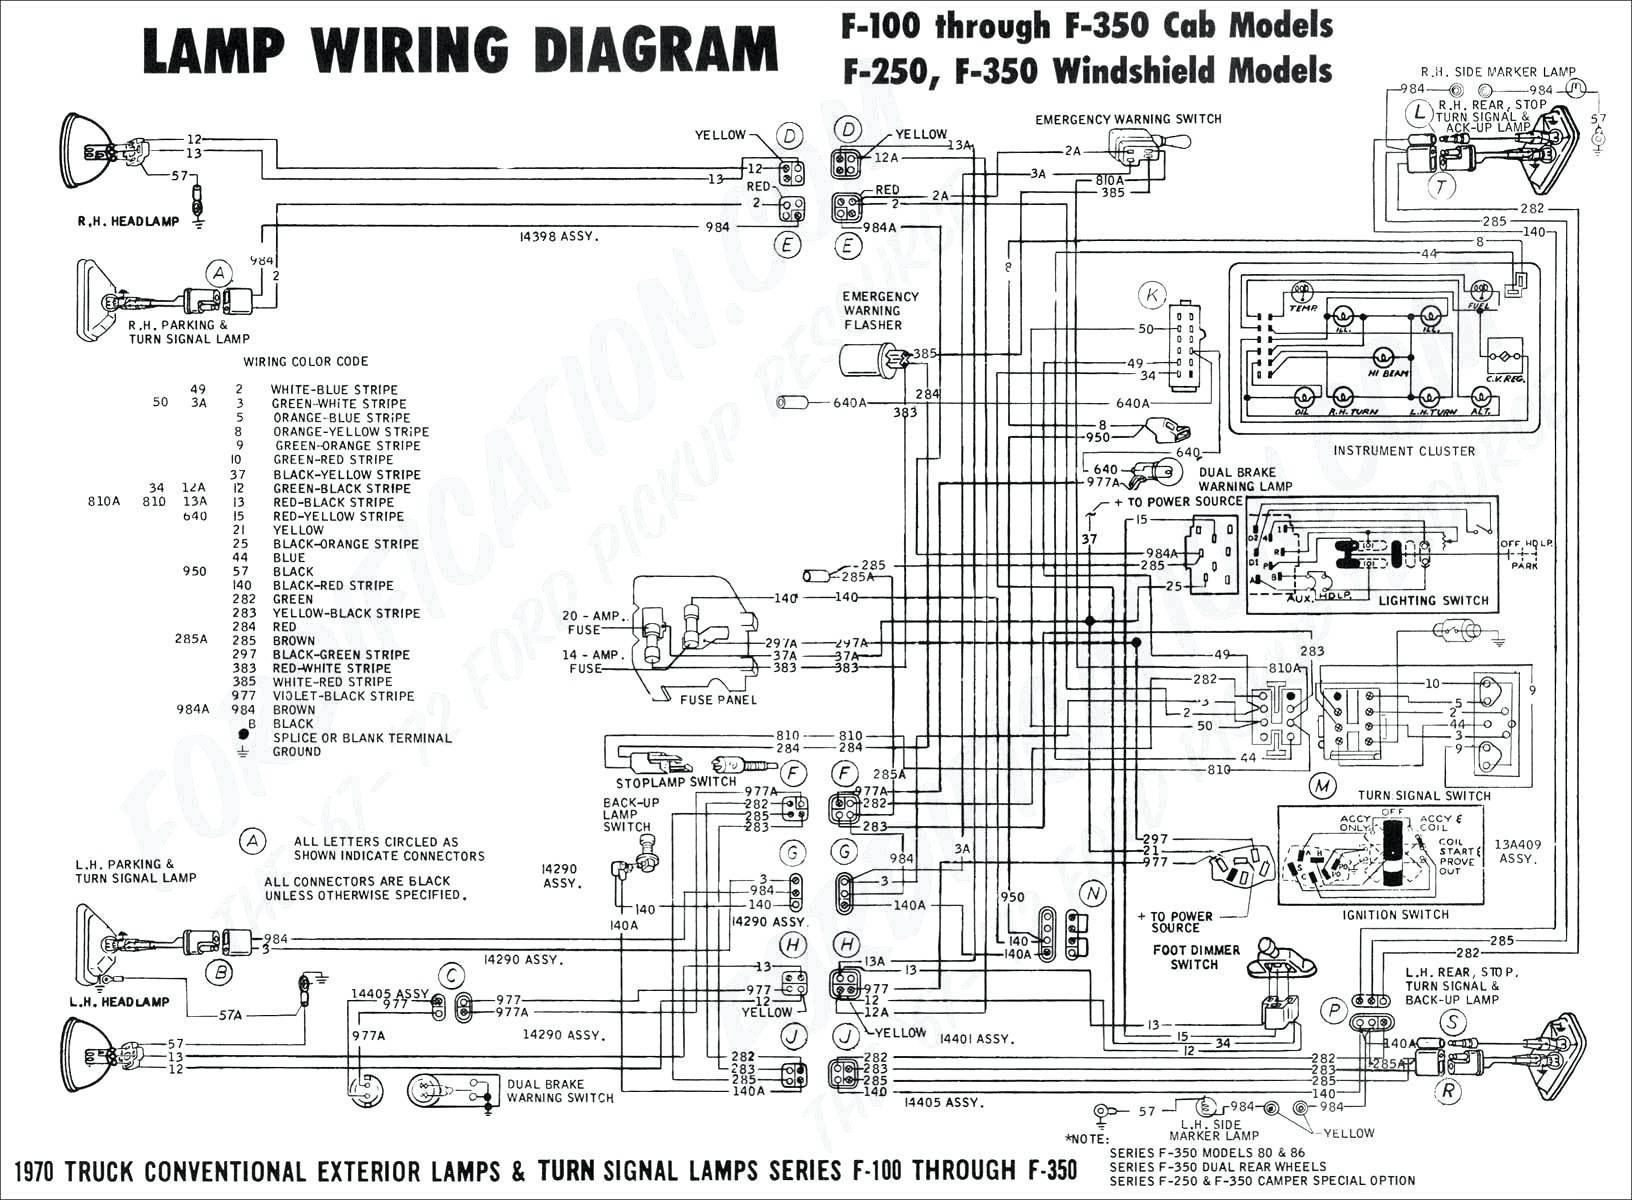 2001 Lincoln town Car Fuse Box Diagram 1996 Oldsmobile